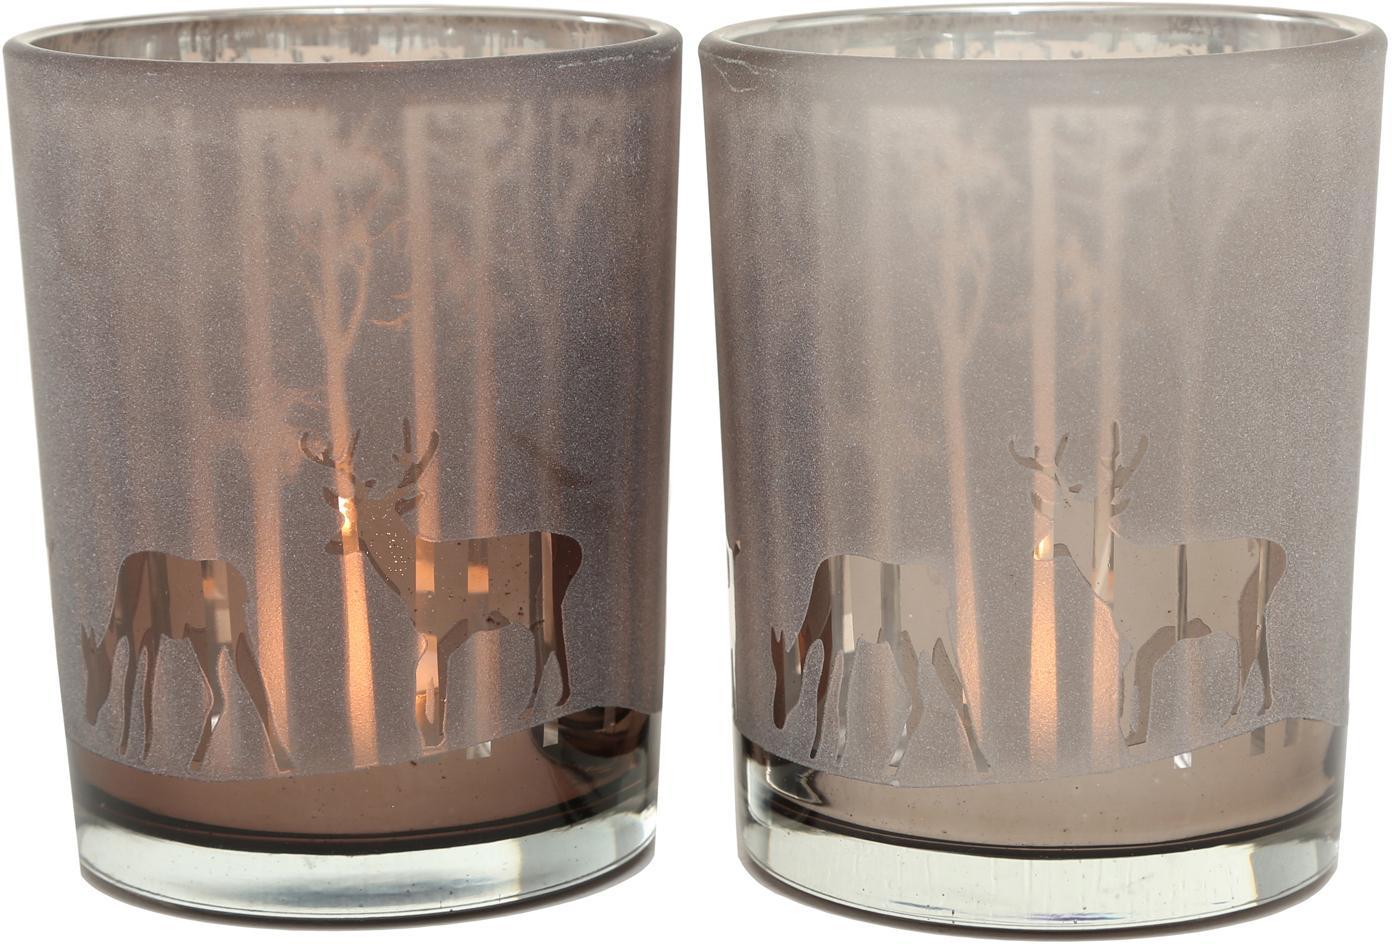 Windlichtenset Colorado, 2-delig, Gelakt glas, Donkerbeige, taupe, Ø 10 cm